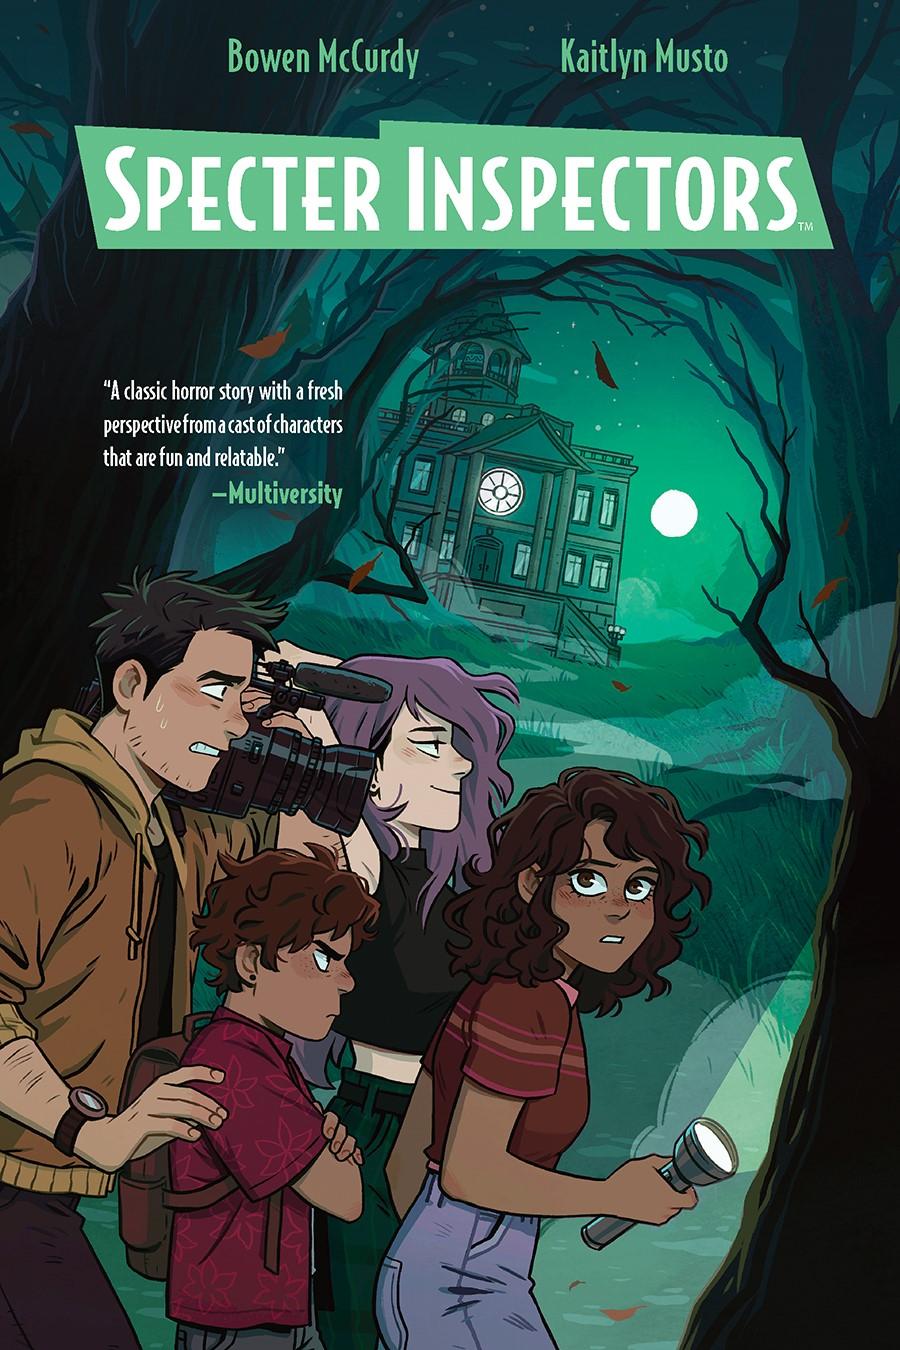 SpecterInspectors_SC_Cover ComicList: BOOM! Studios New Releases for 10/13/2021